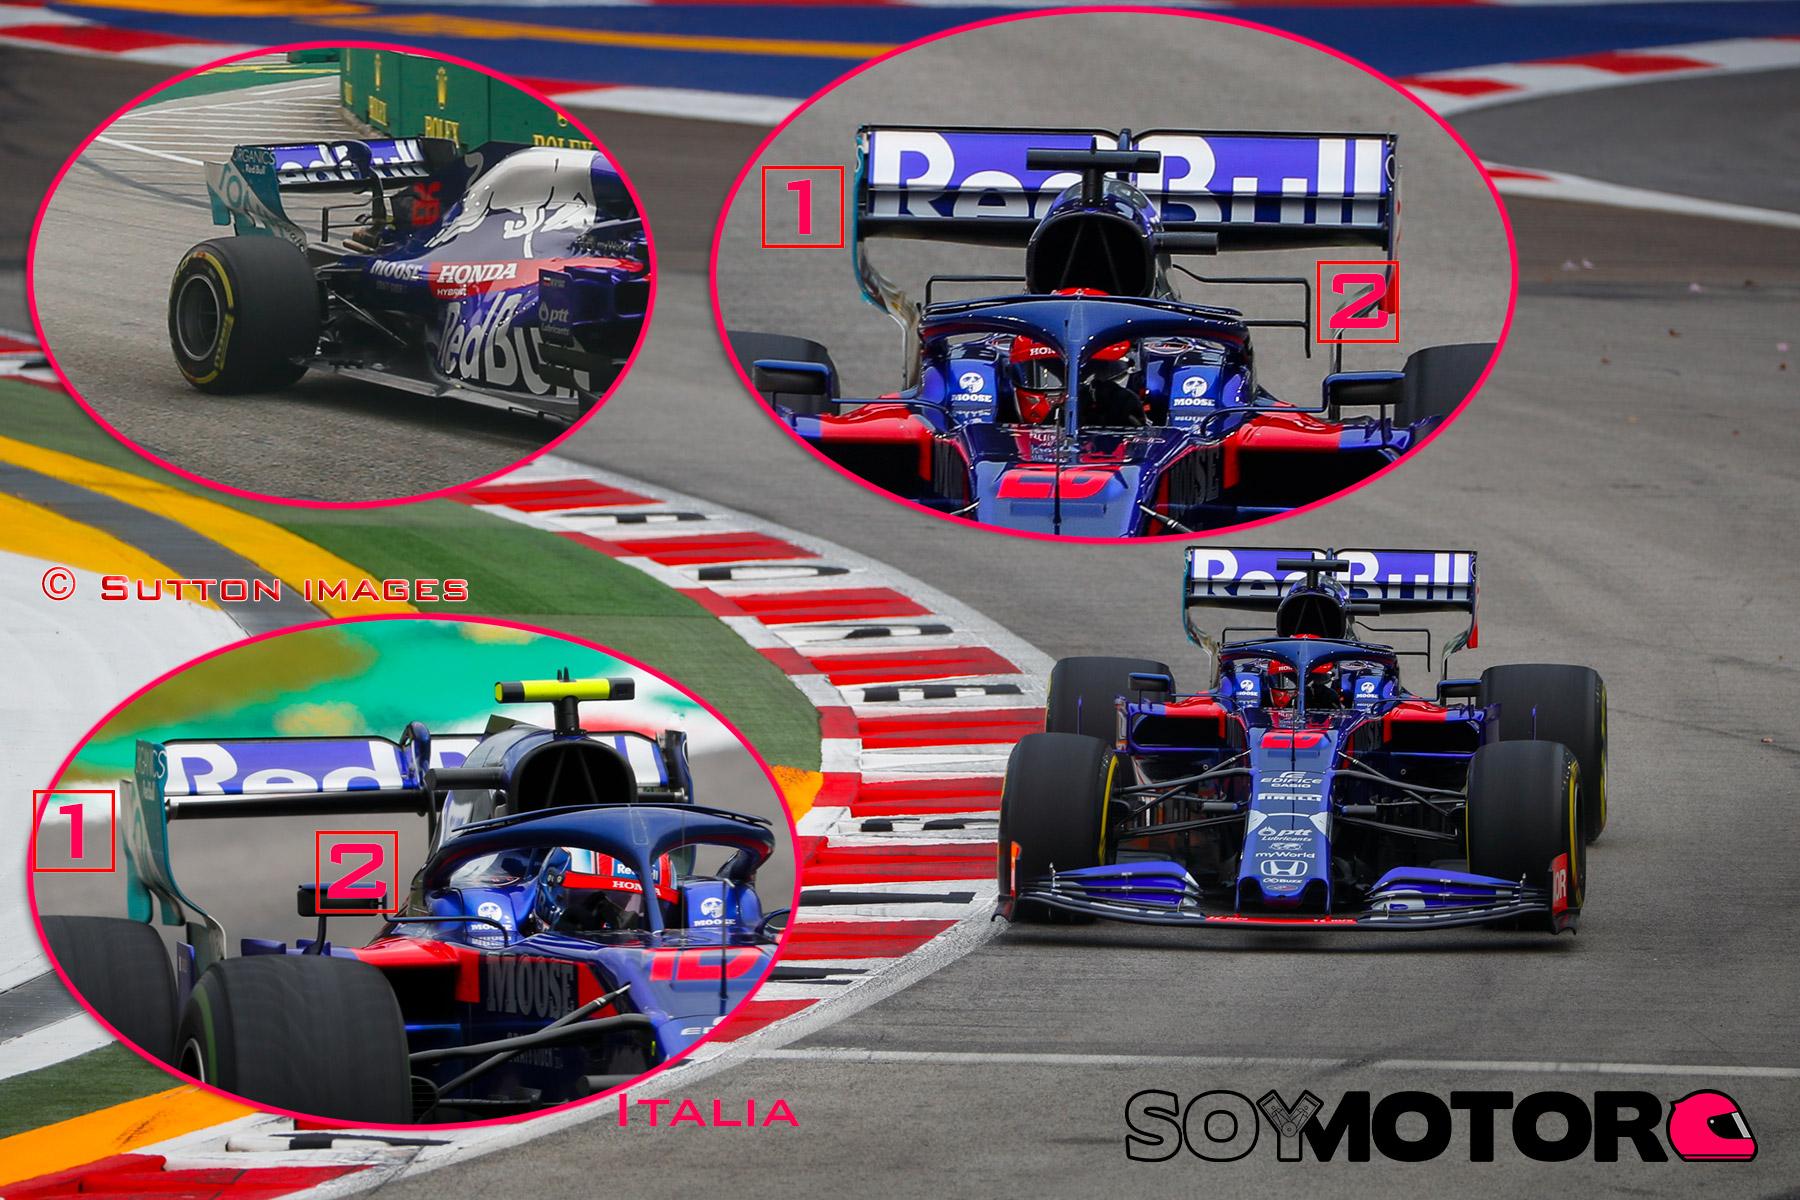 toro-rosso-ala-trasera-y-t-wing-soymotor_0.jpg